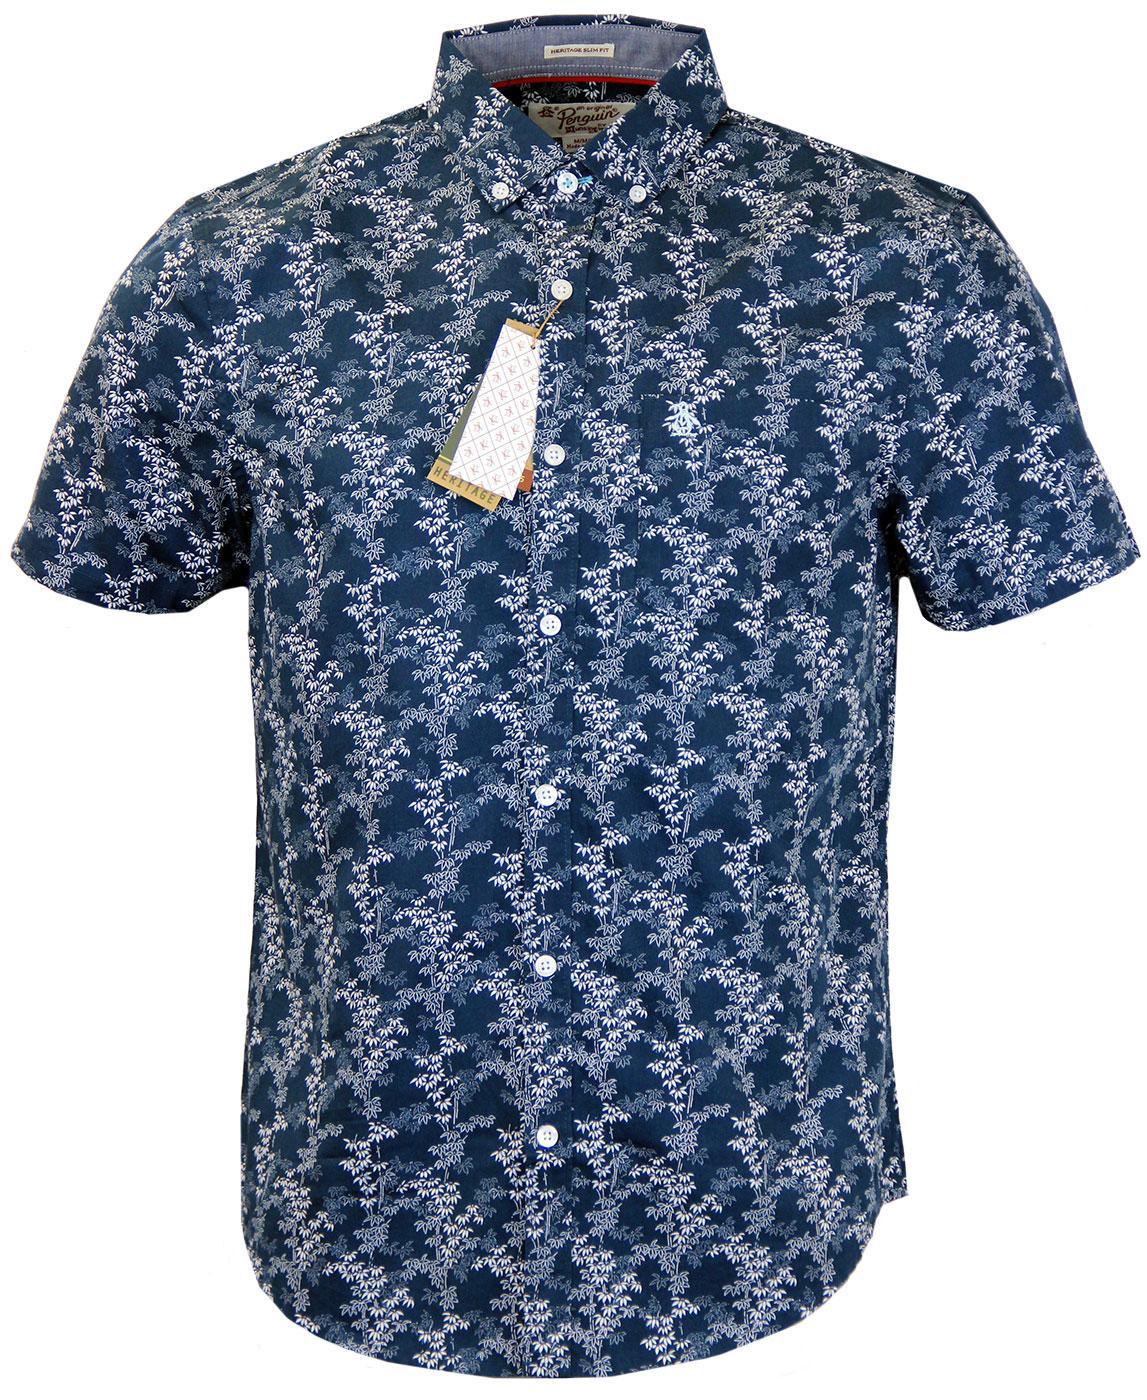 ORGINAL PENGUIN Retro Mod Floral Bamboo Shirt